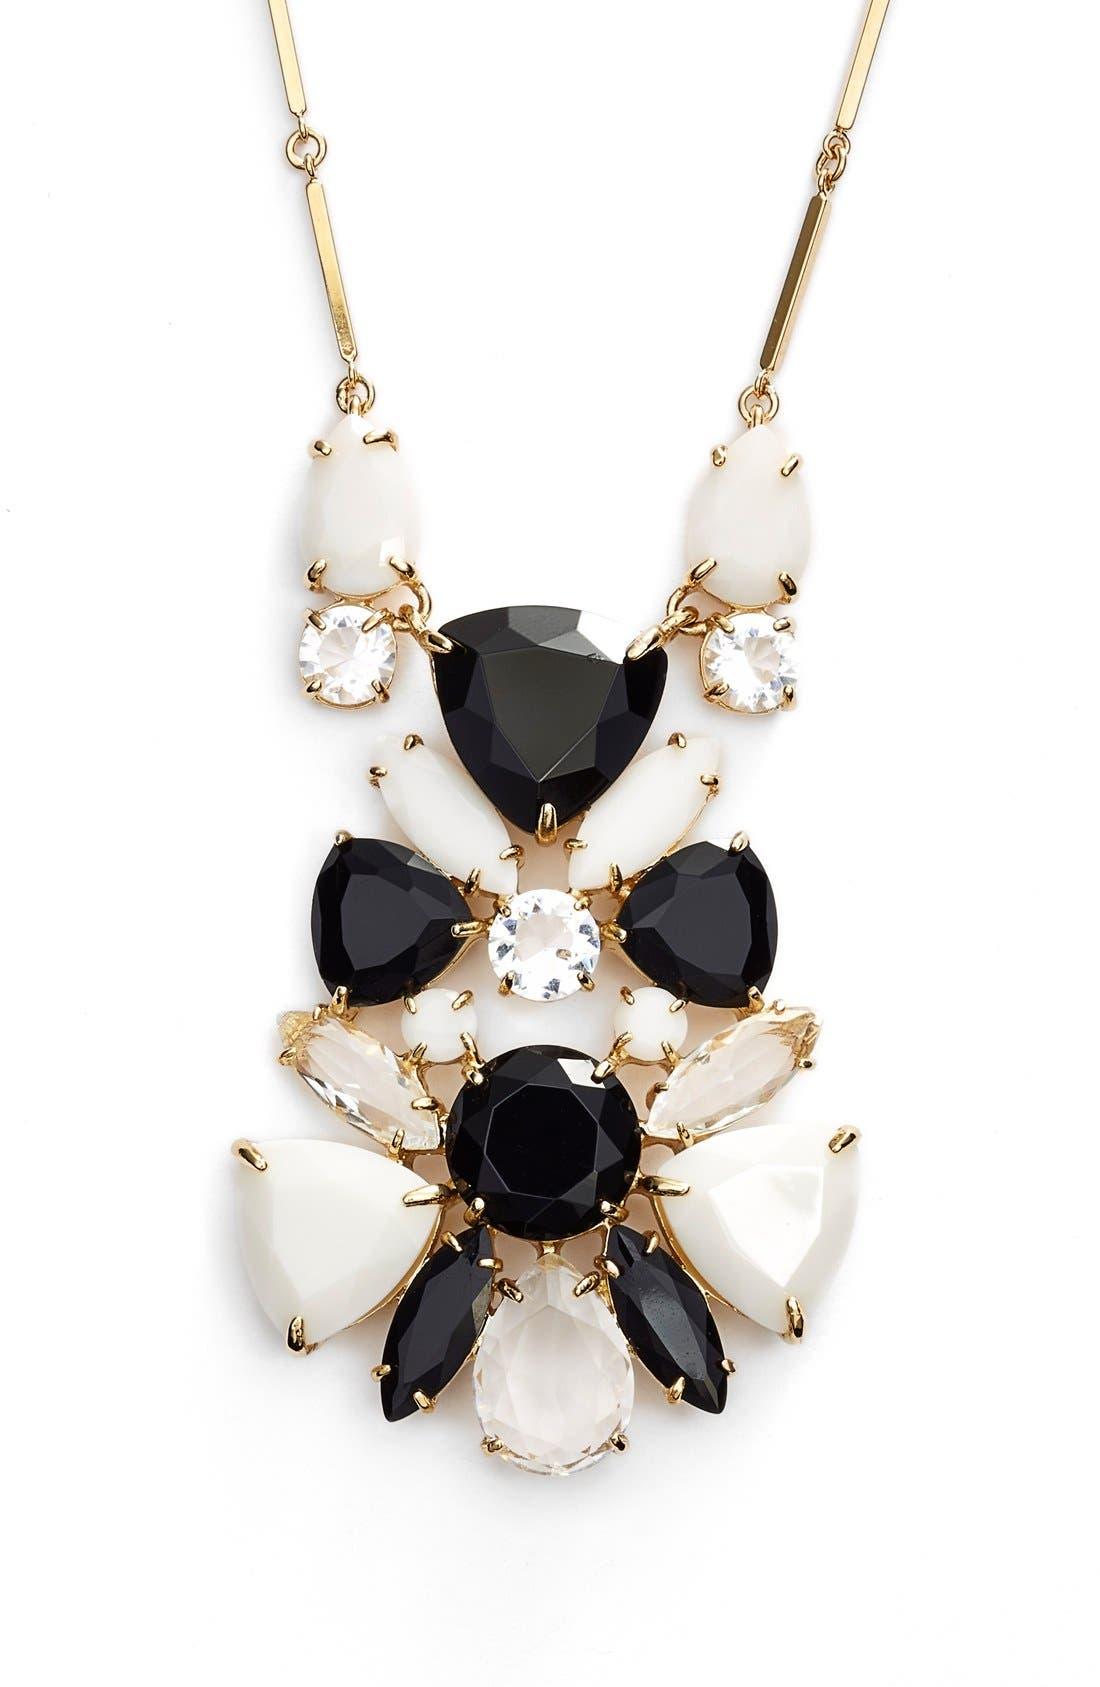 Alternate Image 1 Selected - kate spade new york 'twinkle lights' cluster pendant necklace